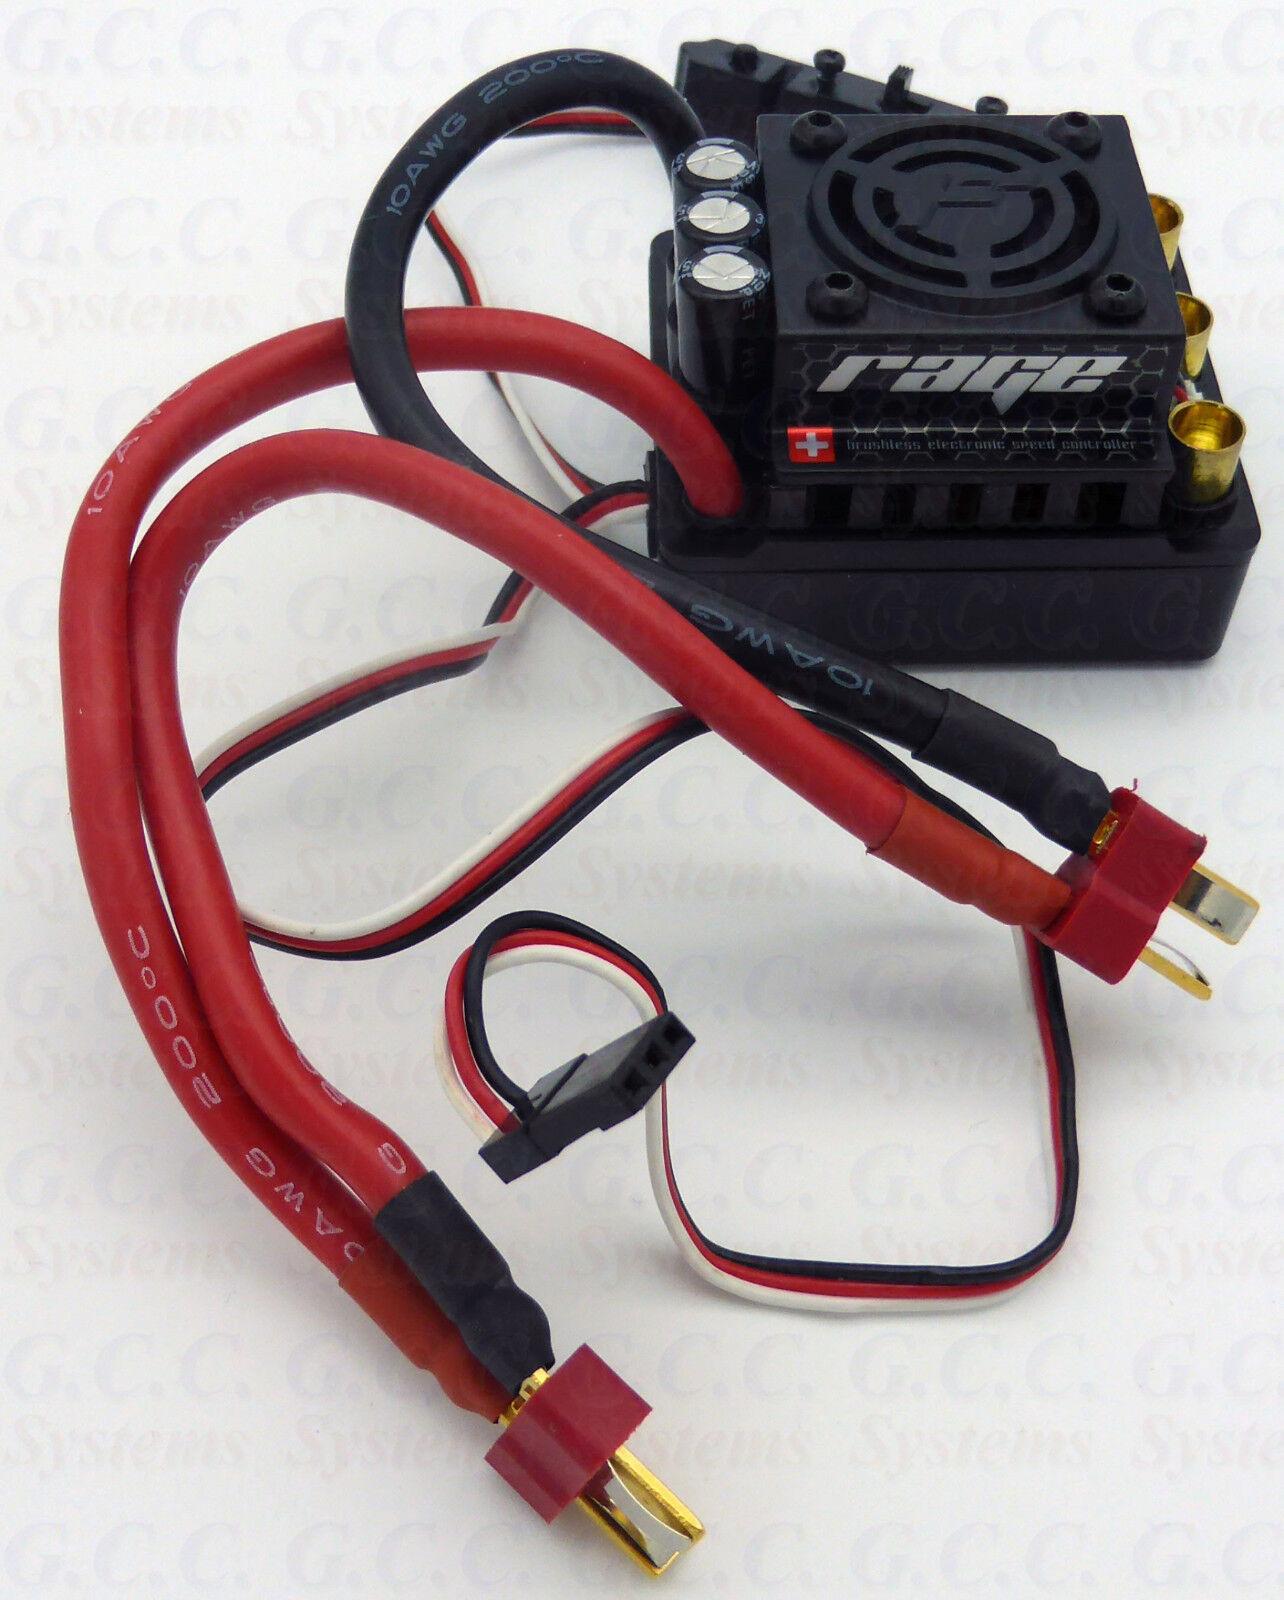 Hpi Racing Flux Rage 80Amp 1 8th Brushless ESC 101712-Nuevo